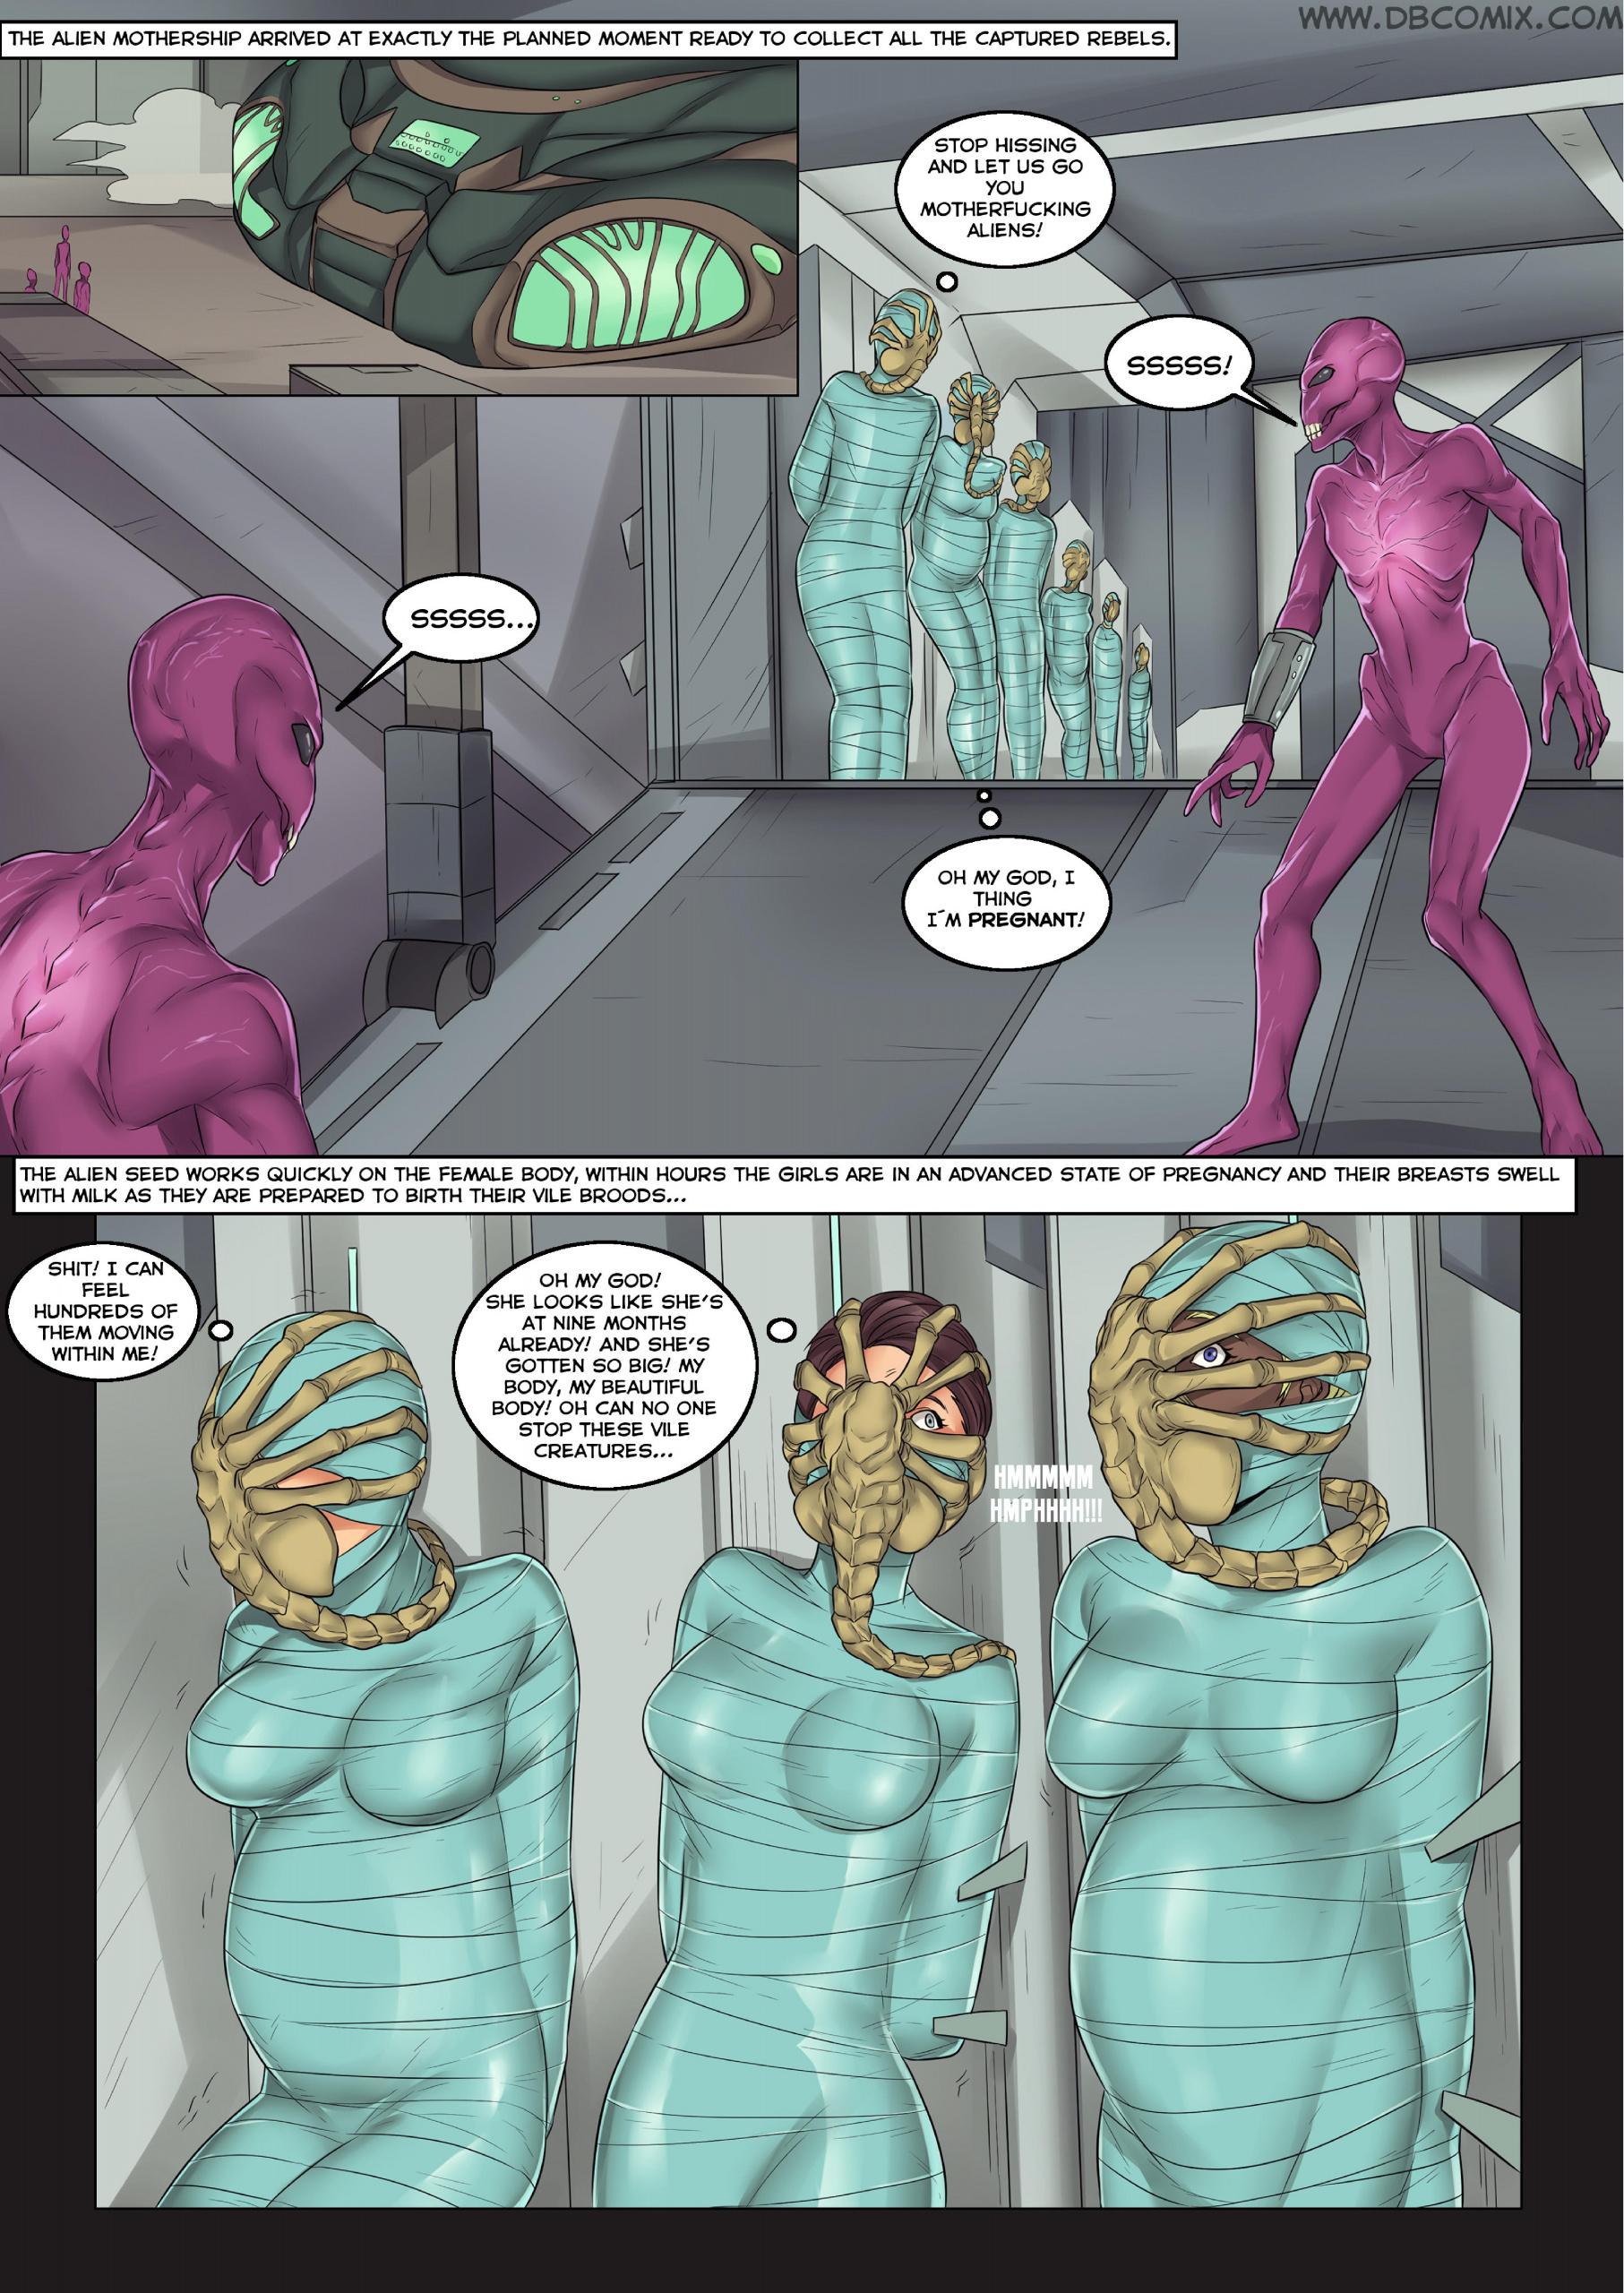 seXCOM - Terror from the deep porn comics Oral sex, Aliens, Anal Sex, BDSM, Double Penetration, Lesbians, Sex Toys, Stockings, Tentacles